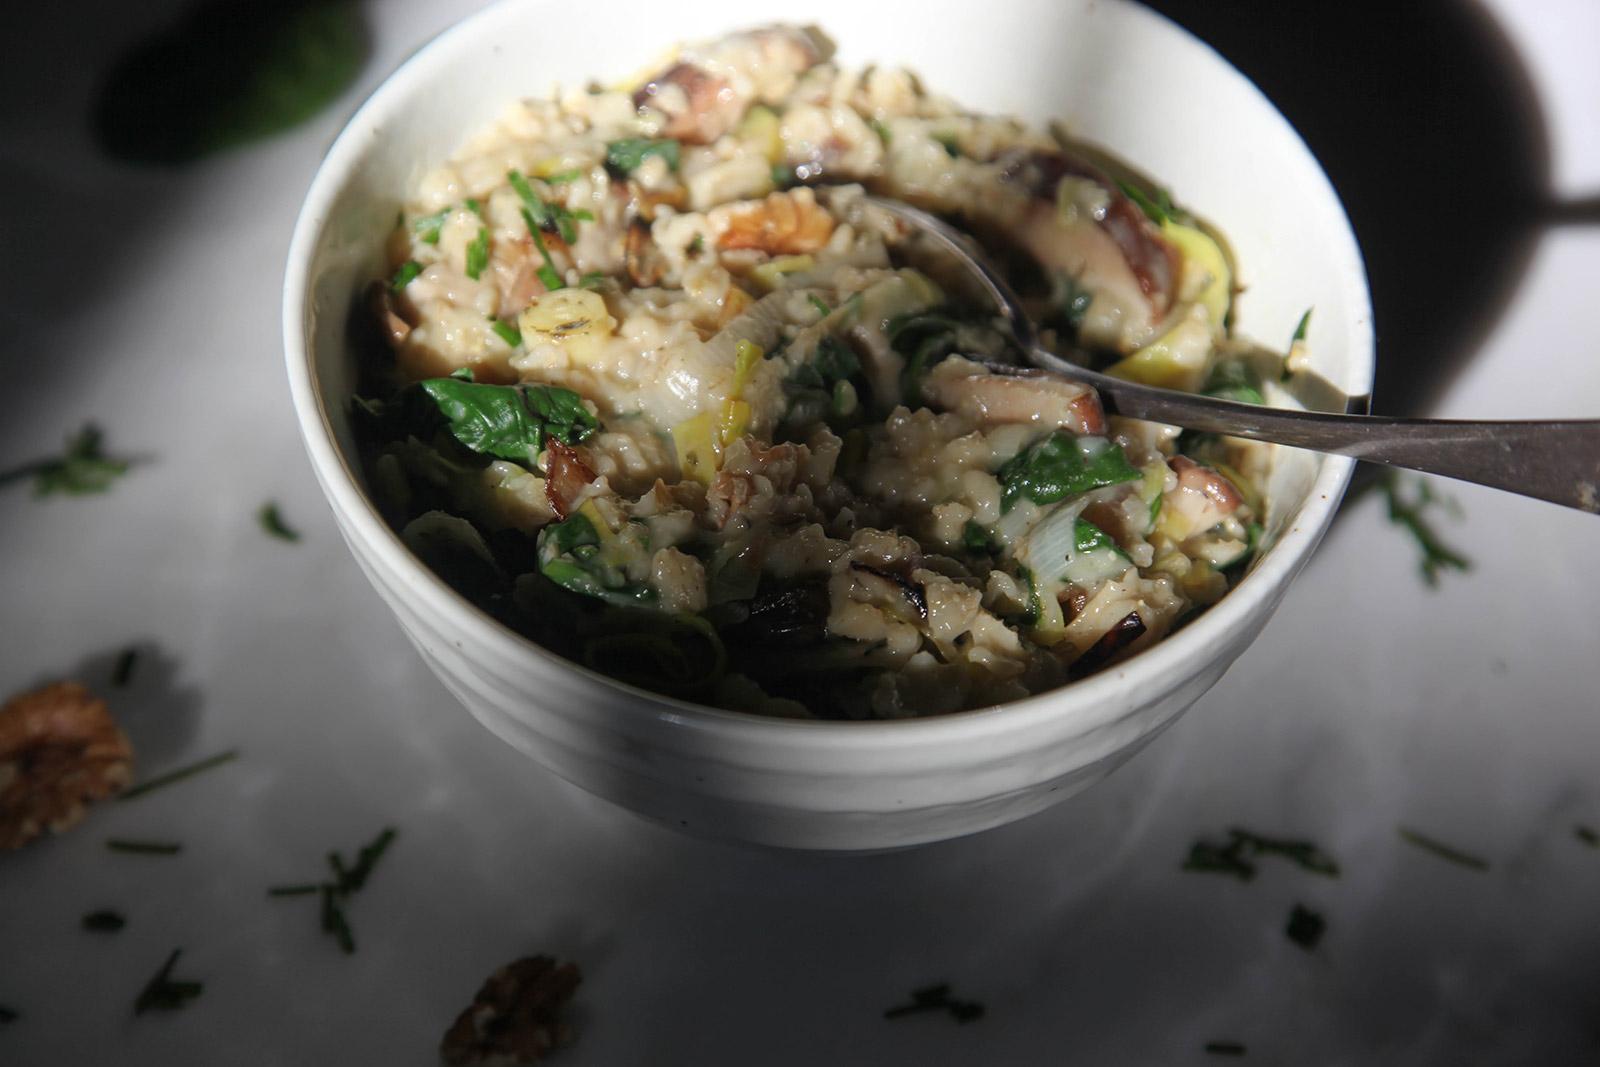 Savory Oatmeal with leeks, shiitake mushrooms, and spinach